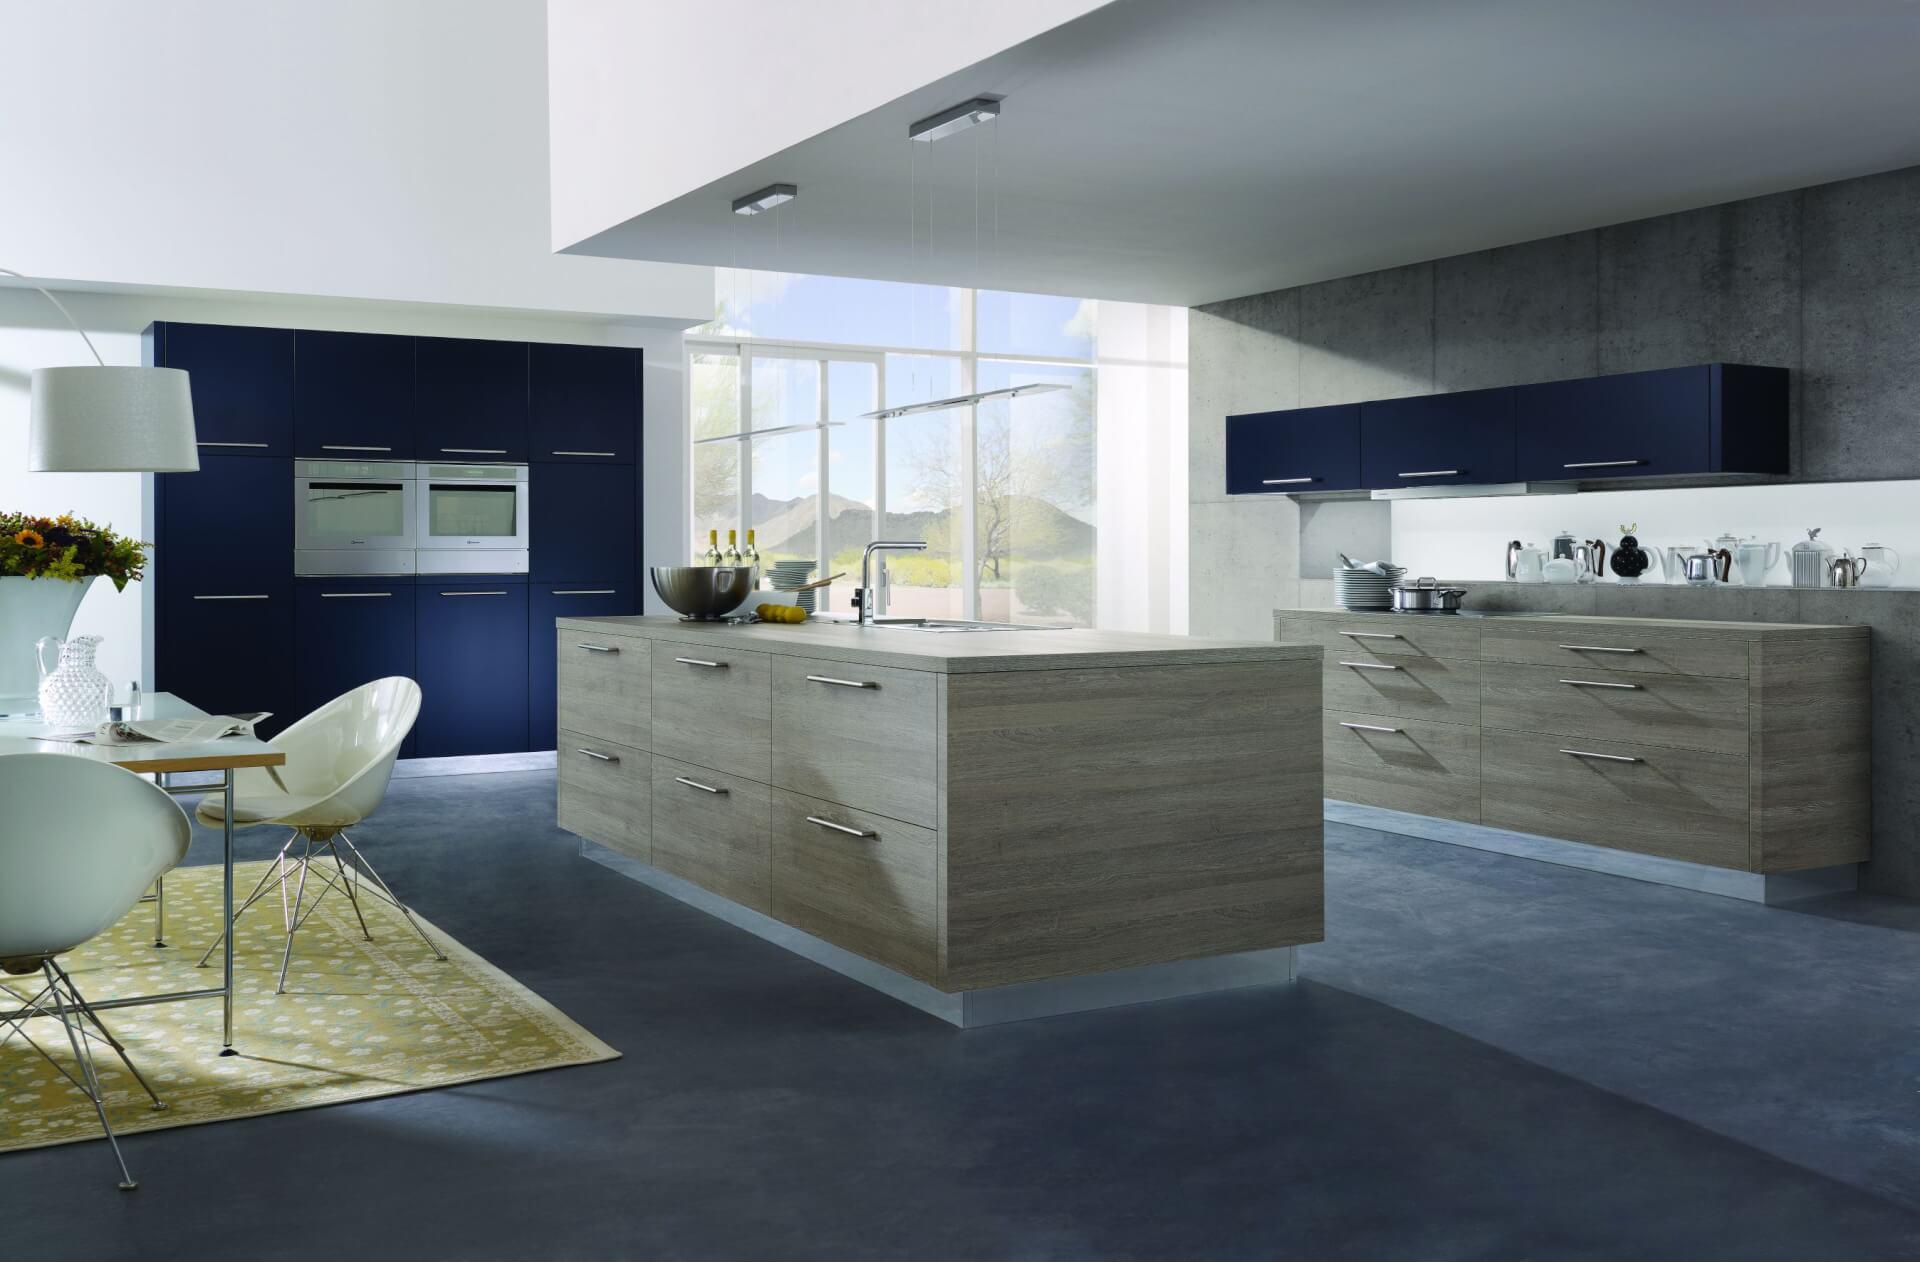 Cool  Living Kitchen Decoration Alno Kitchen With Grey Floor Euro Kitchen Design Alno Cabinets  Modern Design Kitchen Cabinets Kitchen Design Modern German  ...